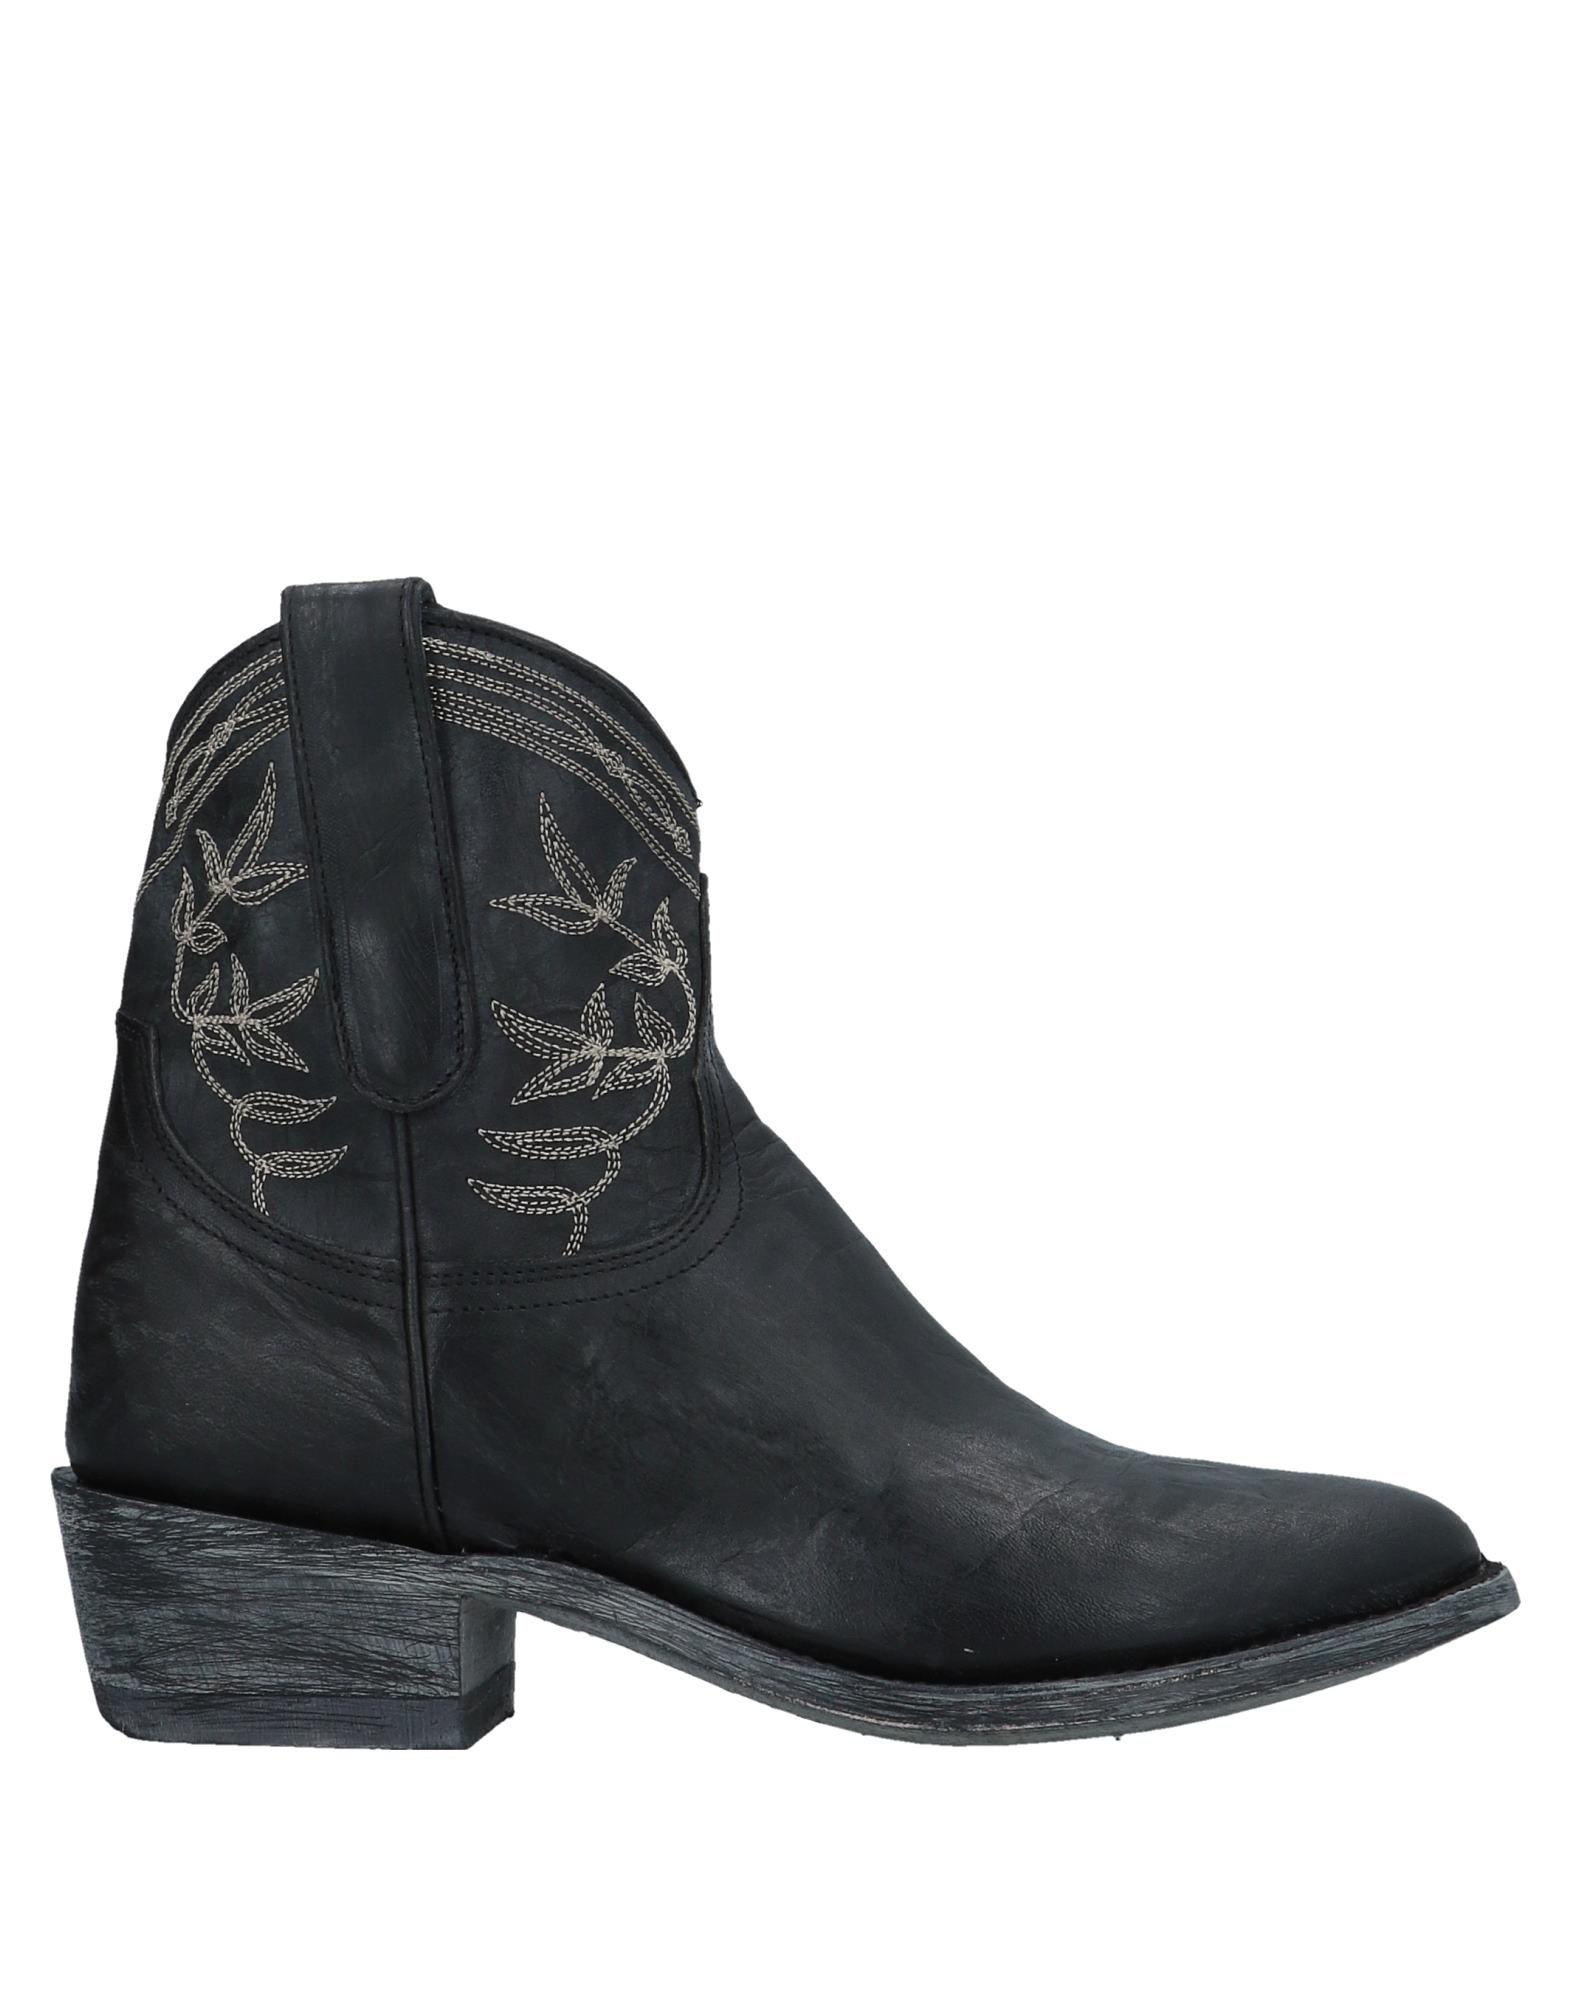 Mexicana Stiefelette Damen    11536550SL Heiße Schuhe 36b806